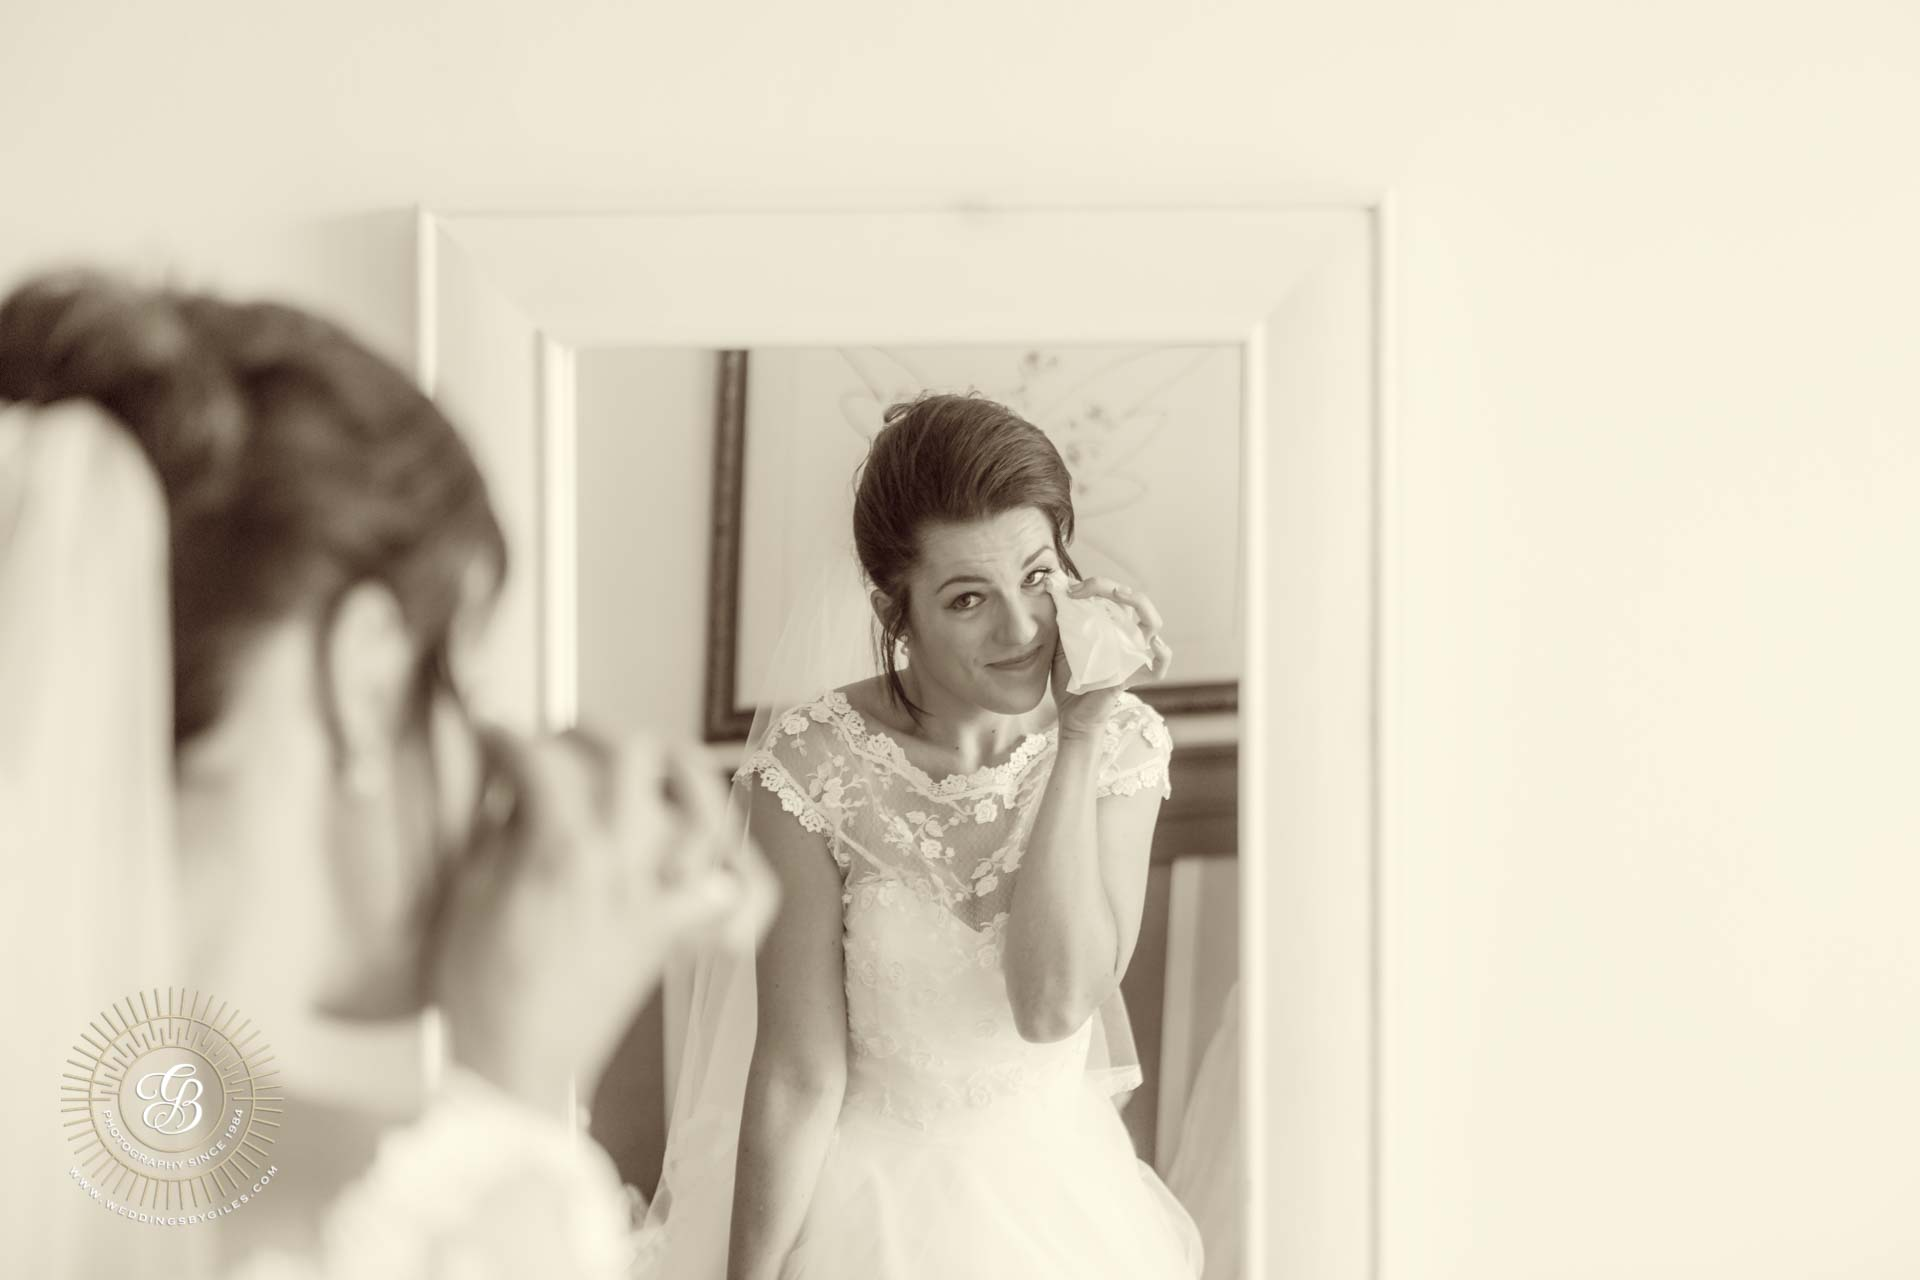 A brides tears